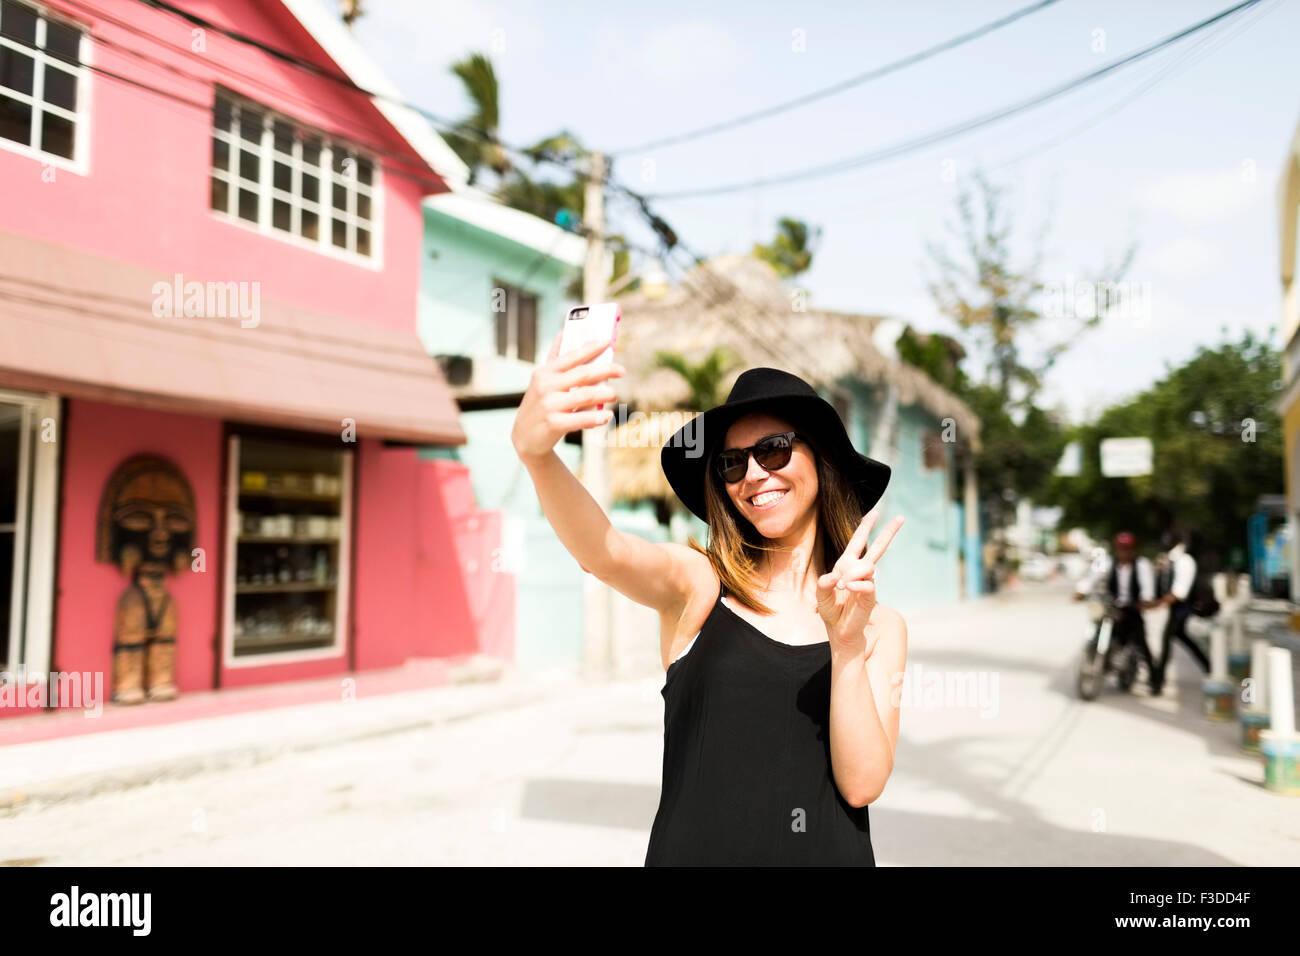 Woman photographing self - Stock Image